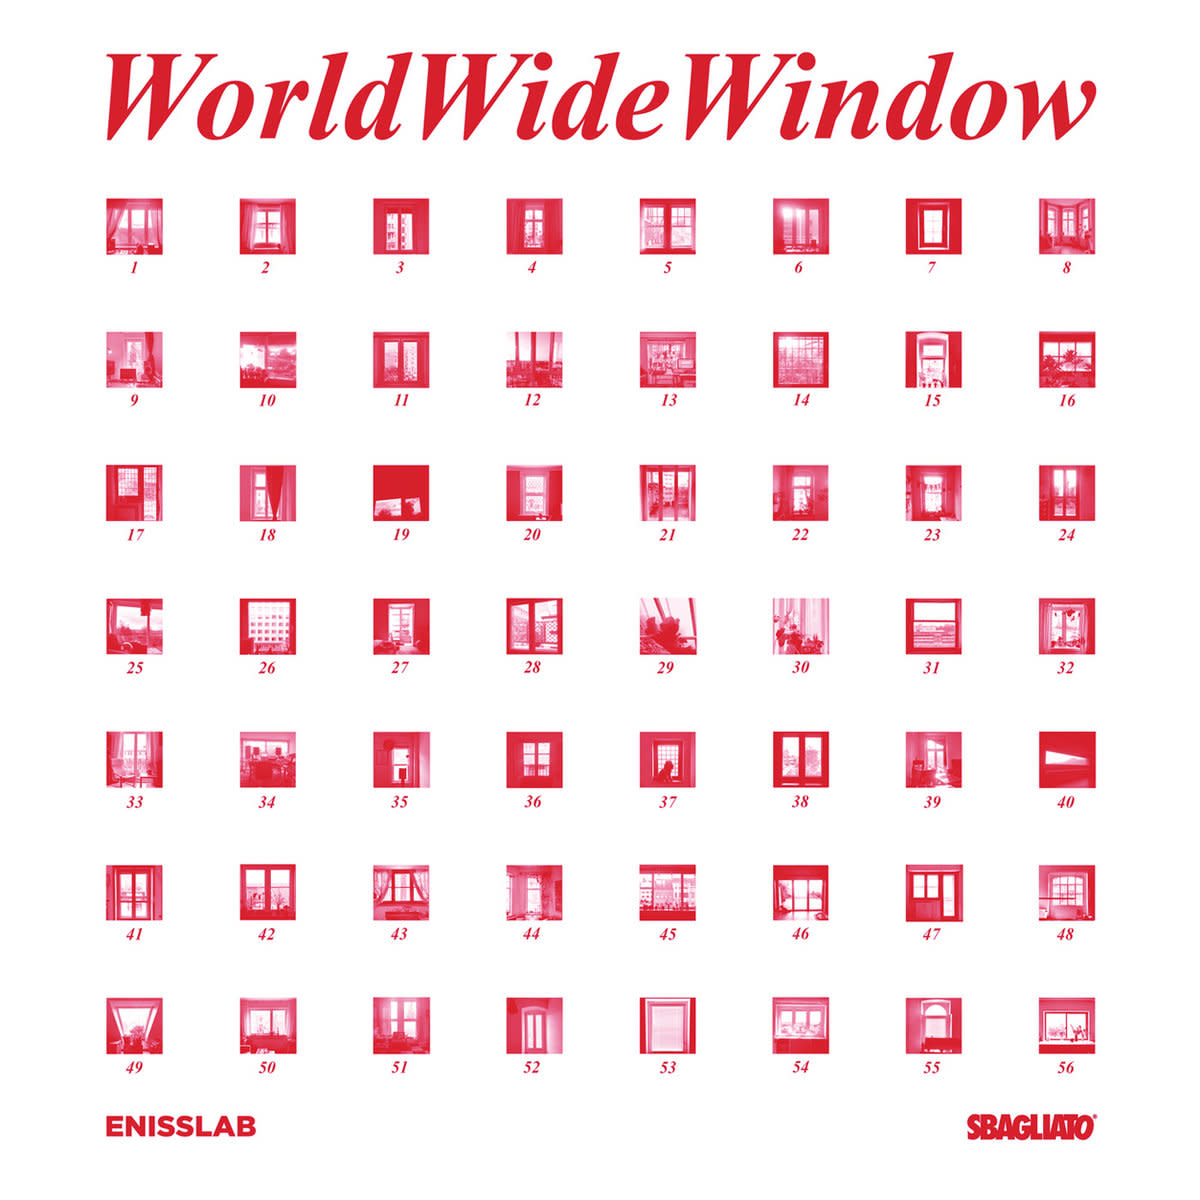 WorldWideWindow Compilation